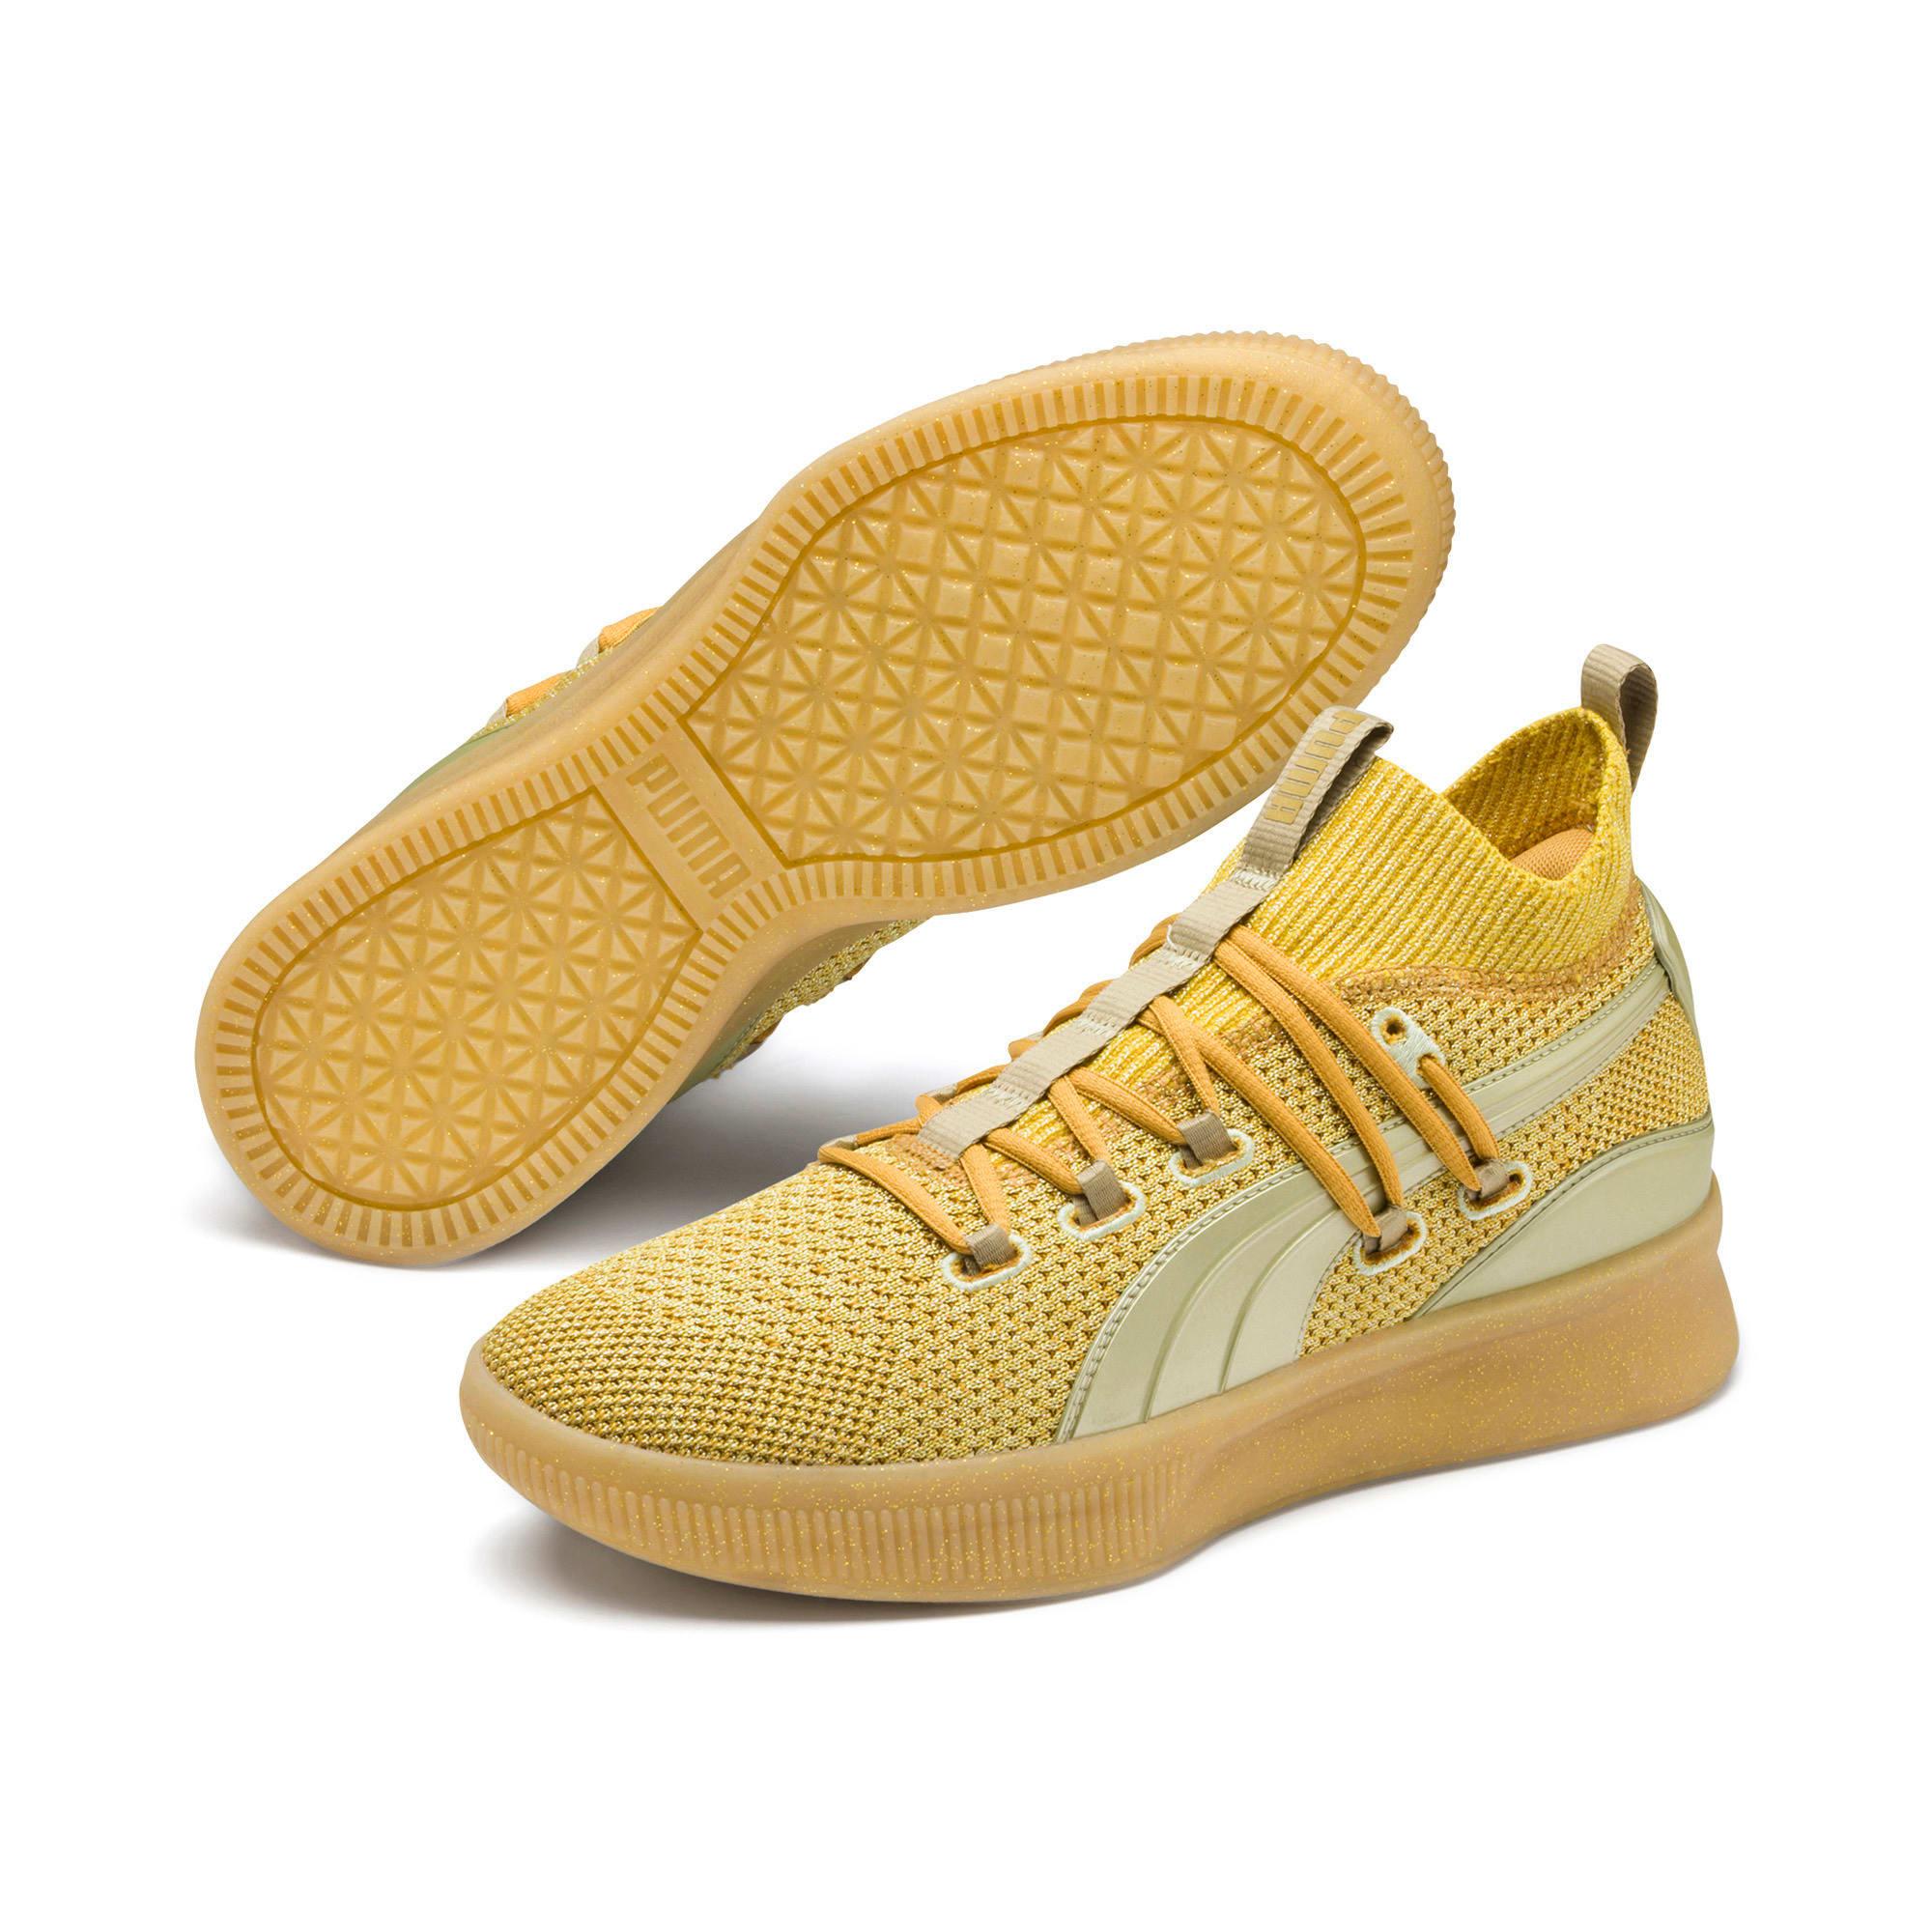 Thumbnail 2 of Clyde Court Title Run Basketball Shoes, Metallic Gold, medium